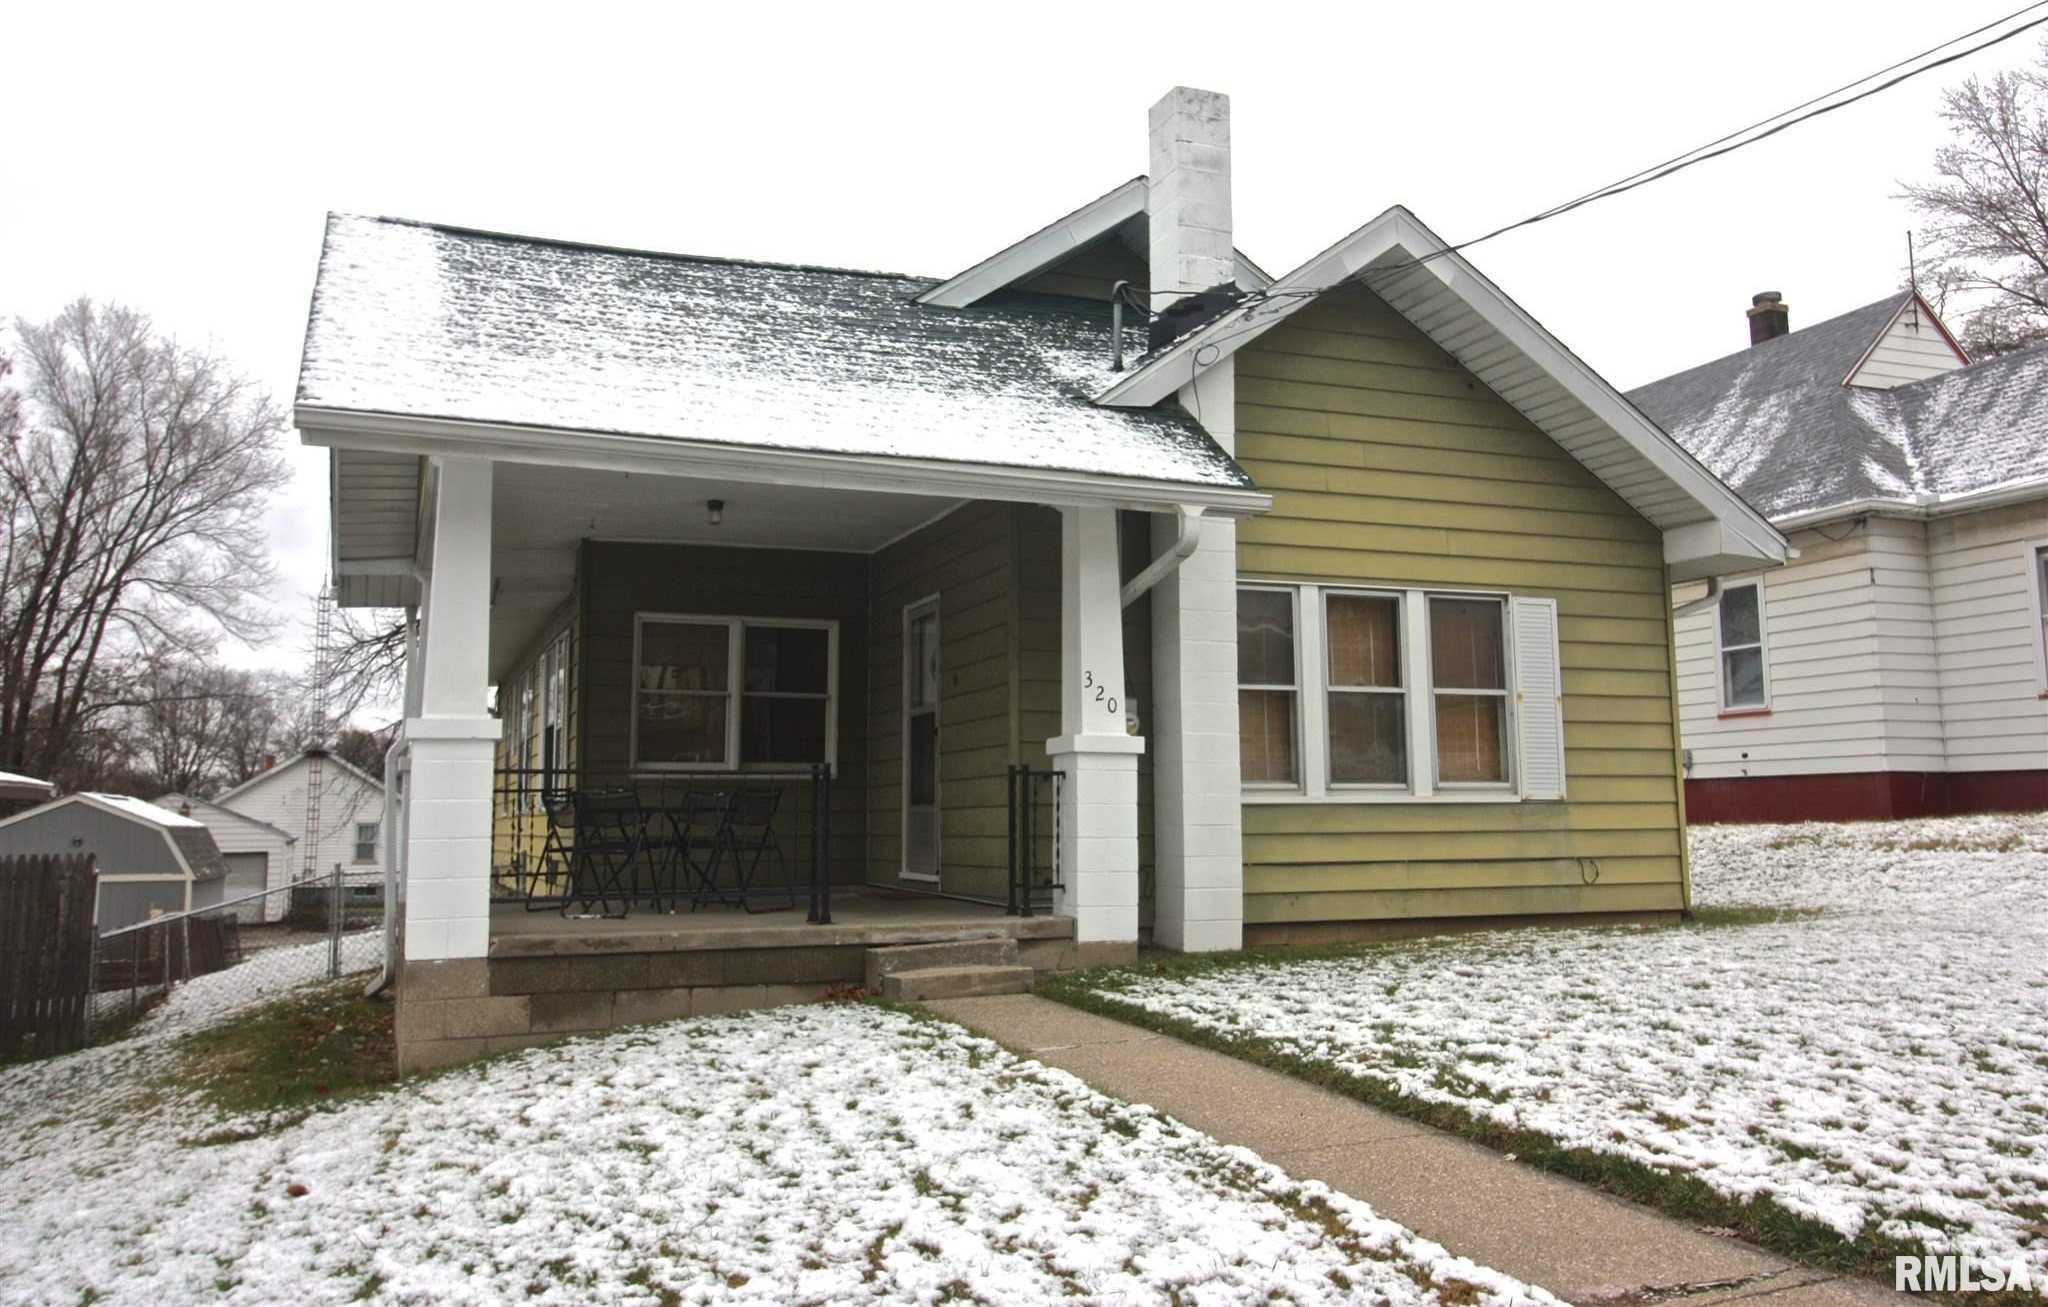 $79,900 - 4Br/1Ba -  for Sale in Sunny Side, Bartonville